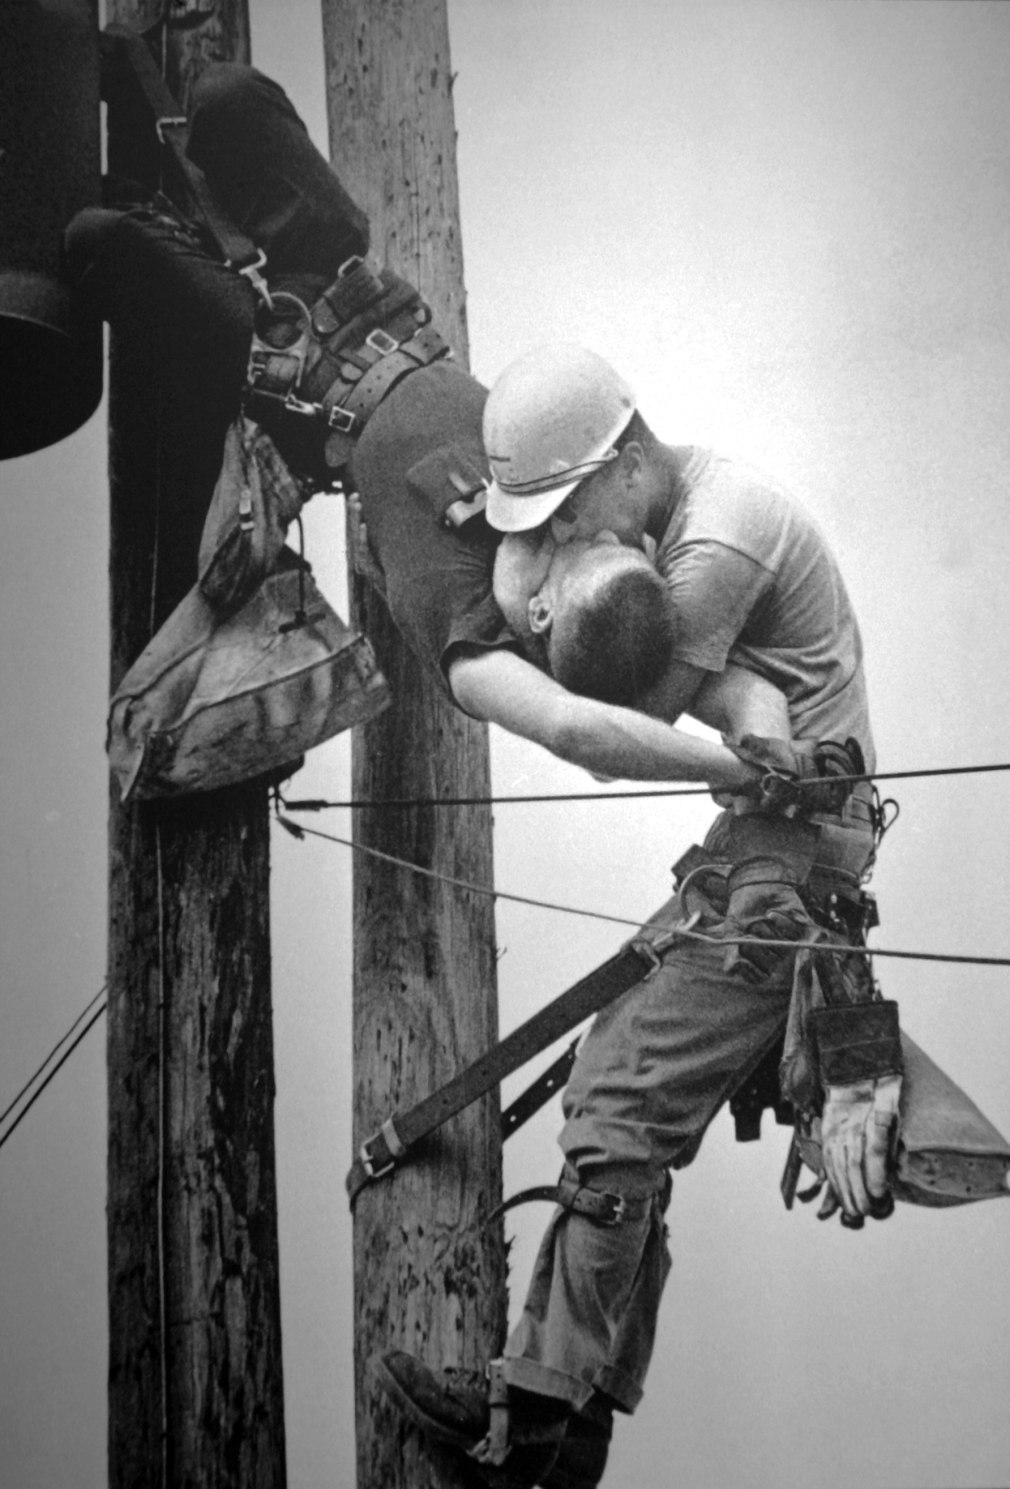 O Beijo da Vida - Pulitzer 1968, Spot News Photography, Rocco Morabito, Jacksonville Journal